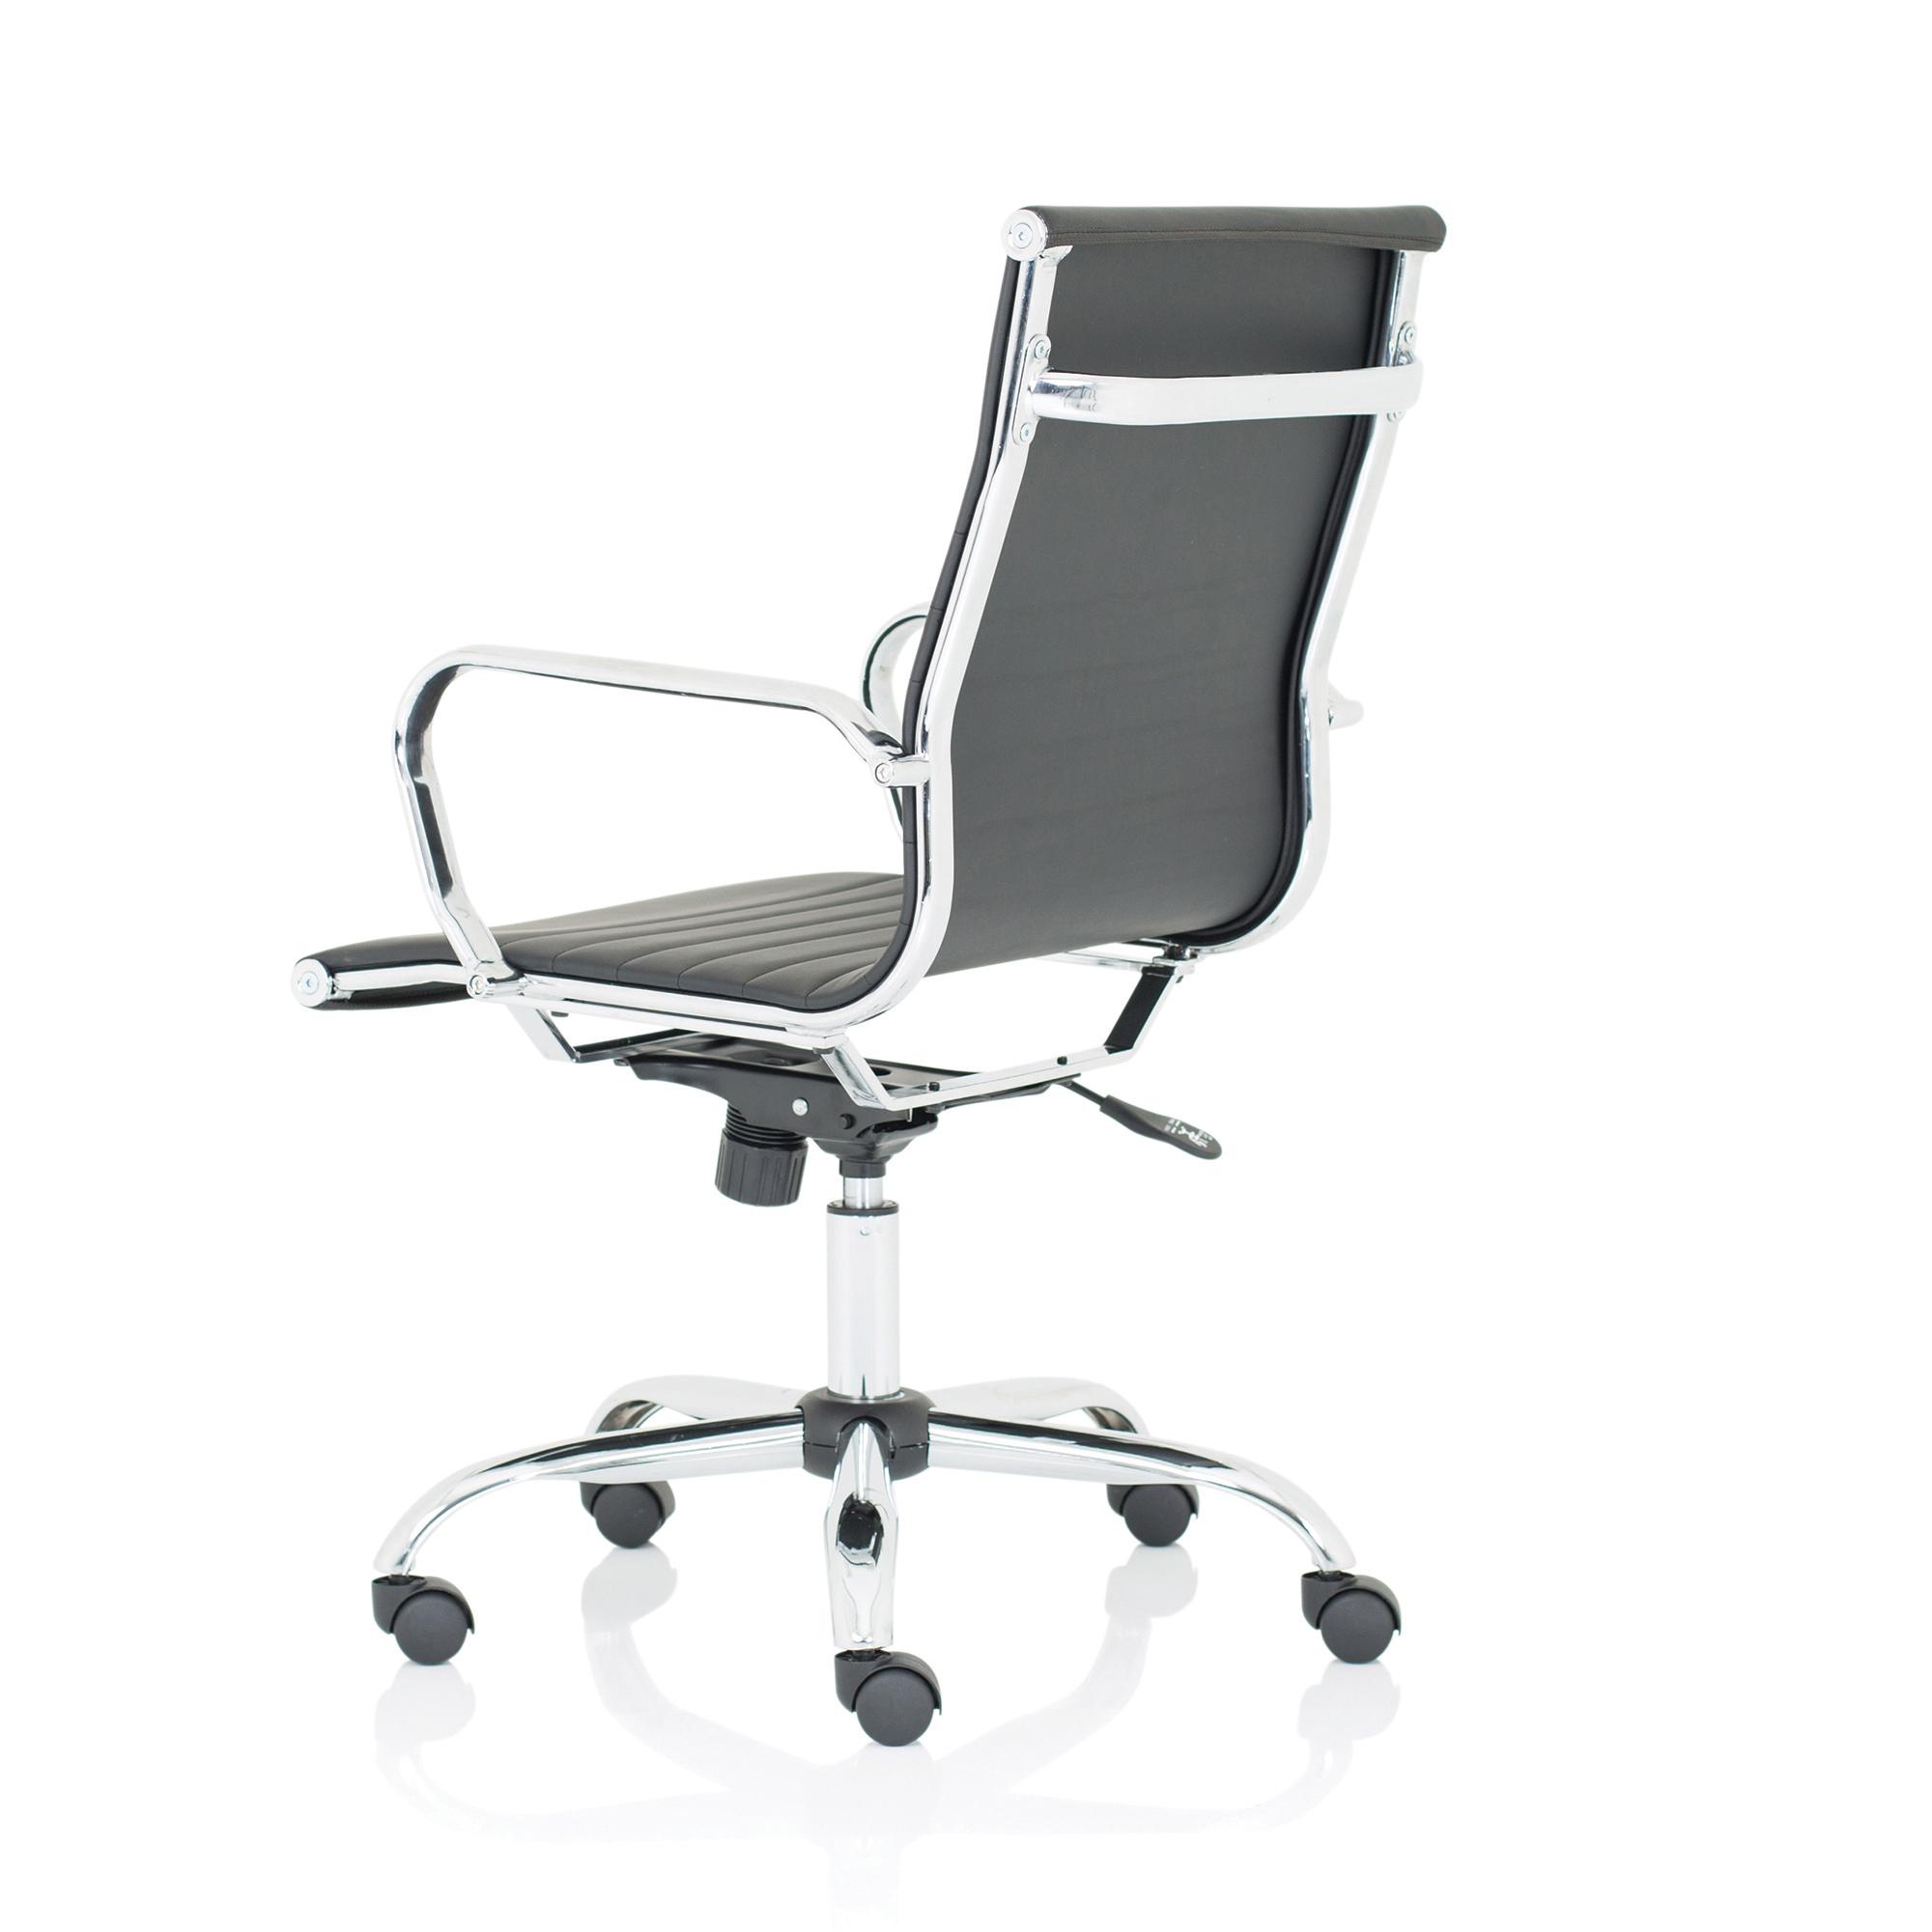 Trexus Nola Medium Executive Chair Bonded Leather Black Ref OP000225